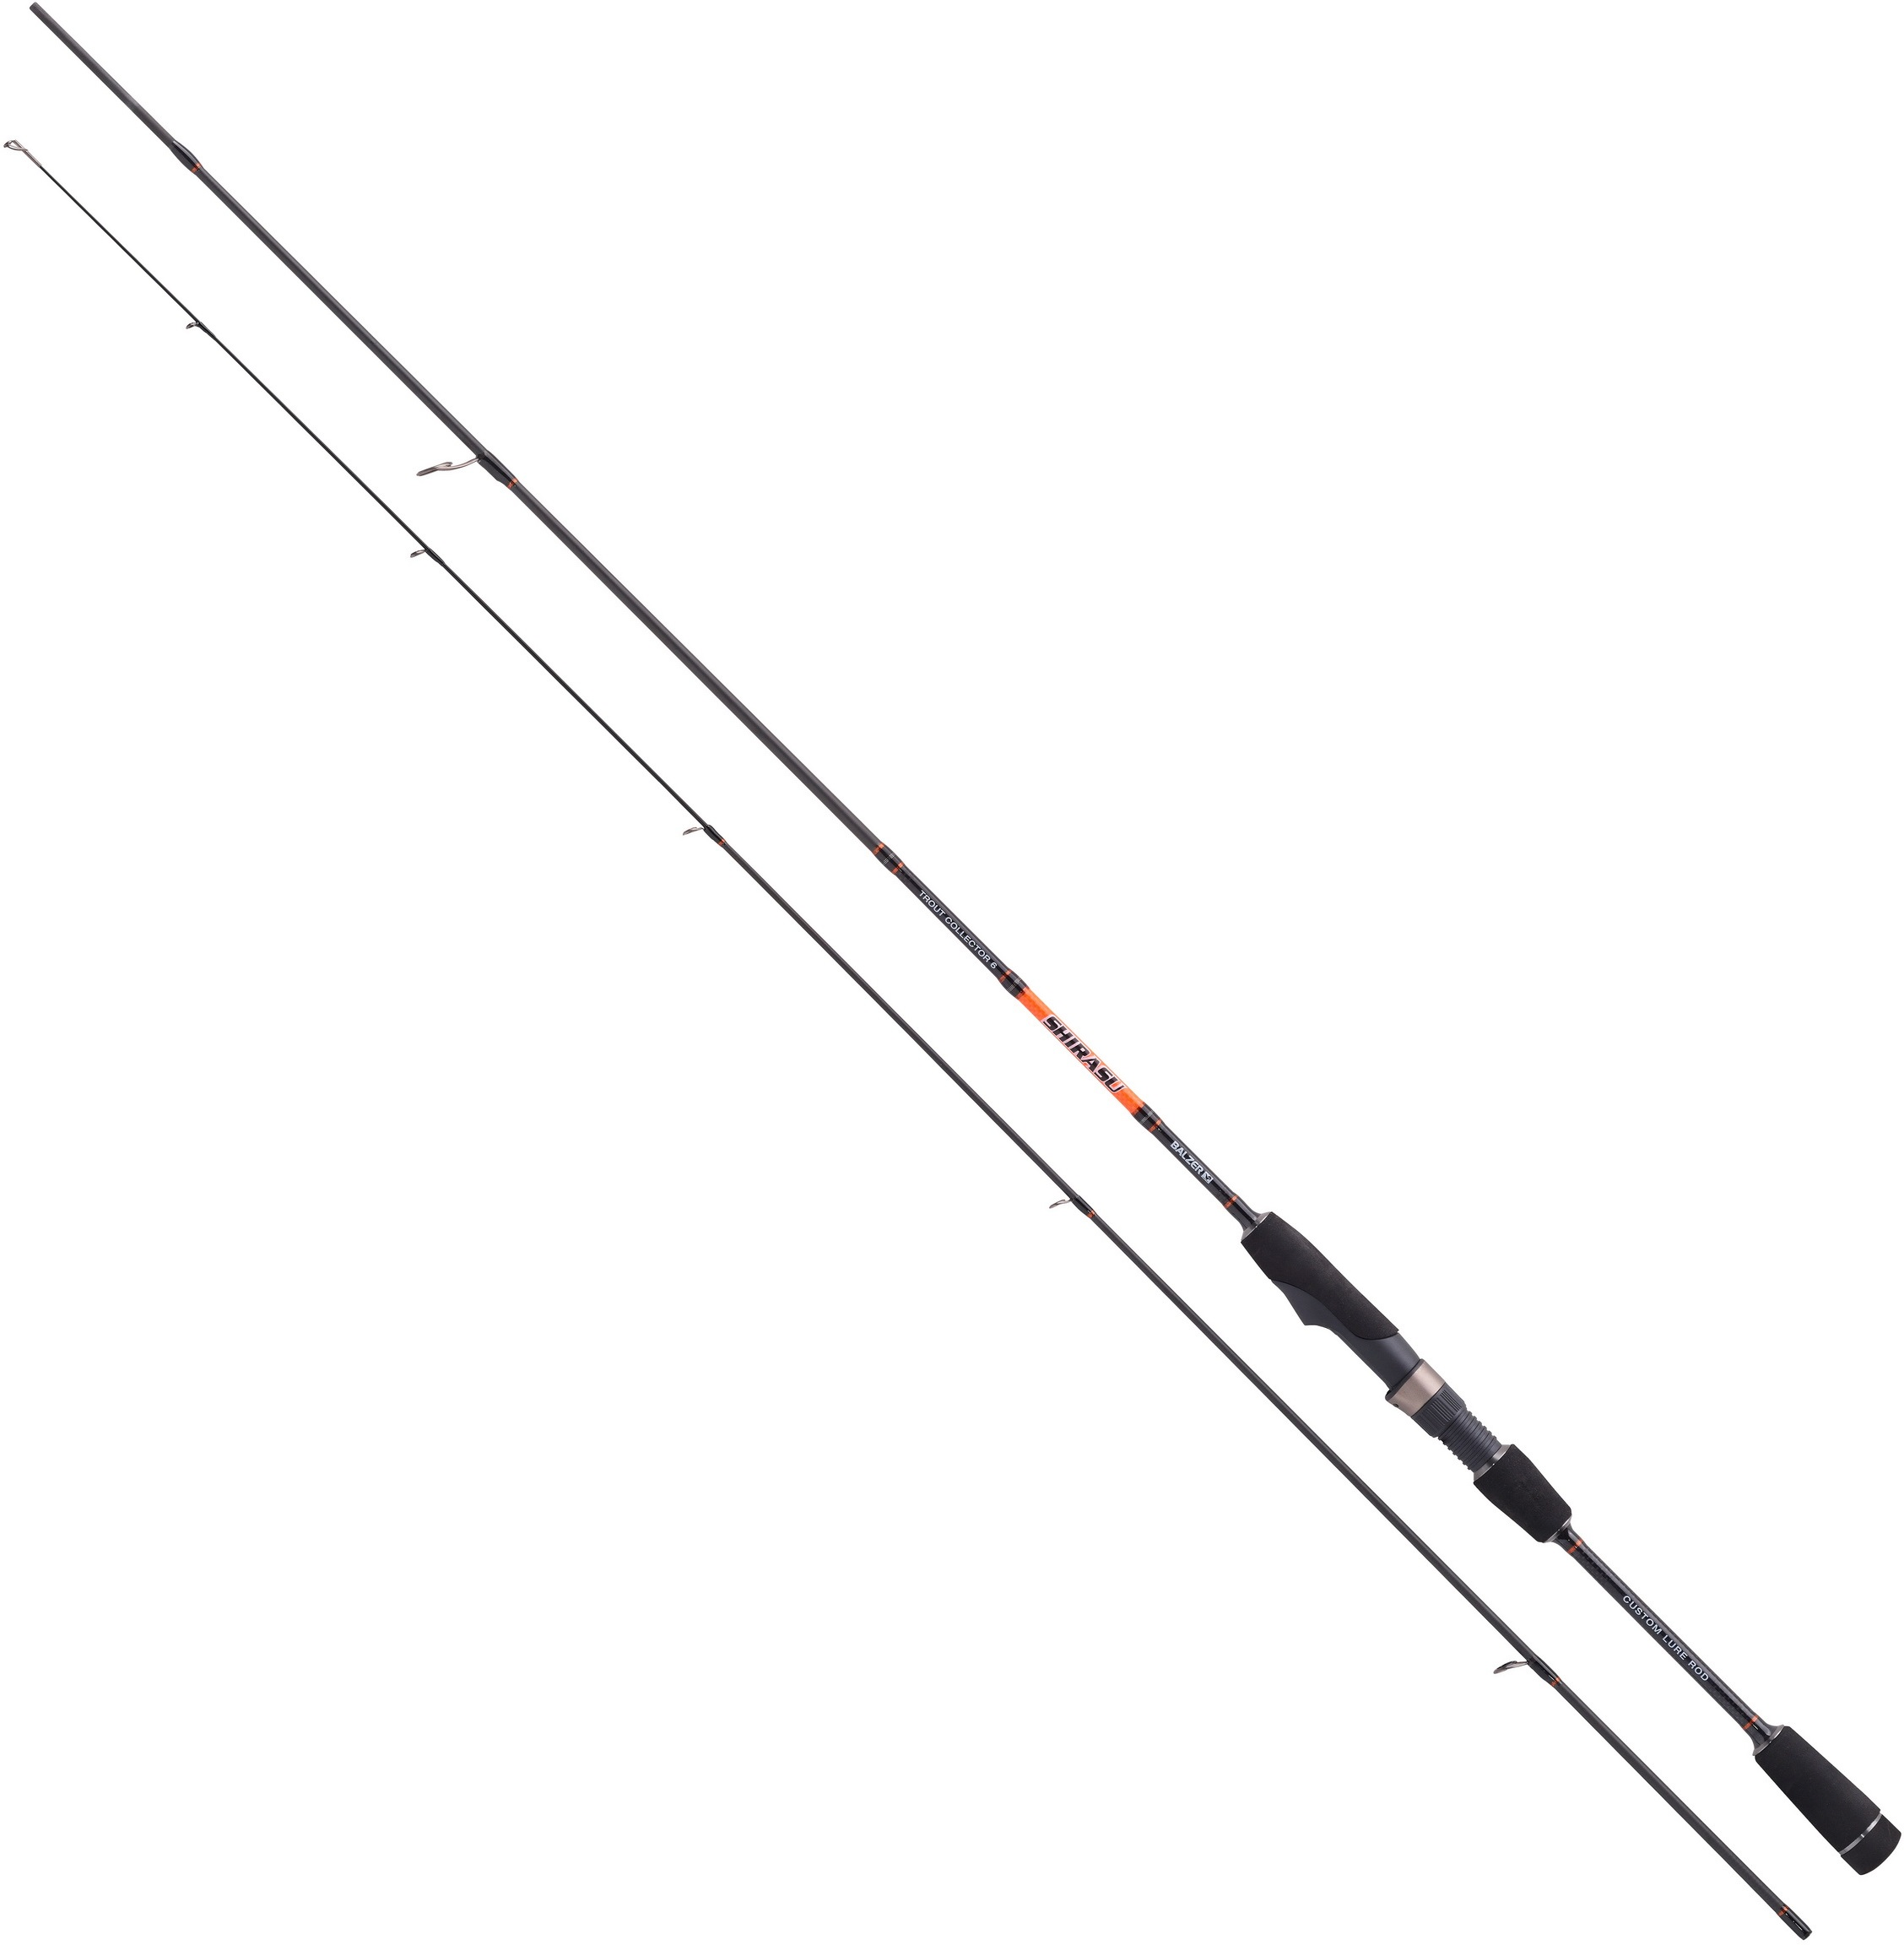 Спиннинг Balzer Shirasu IM-8 Pro Staff Trout Collector 6 Spin 1.85м 0.8-6г